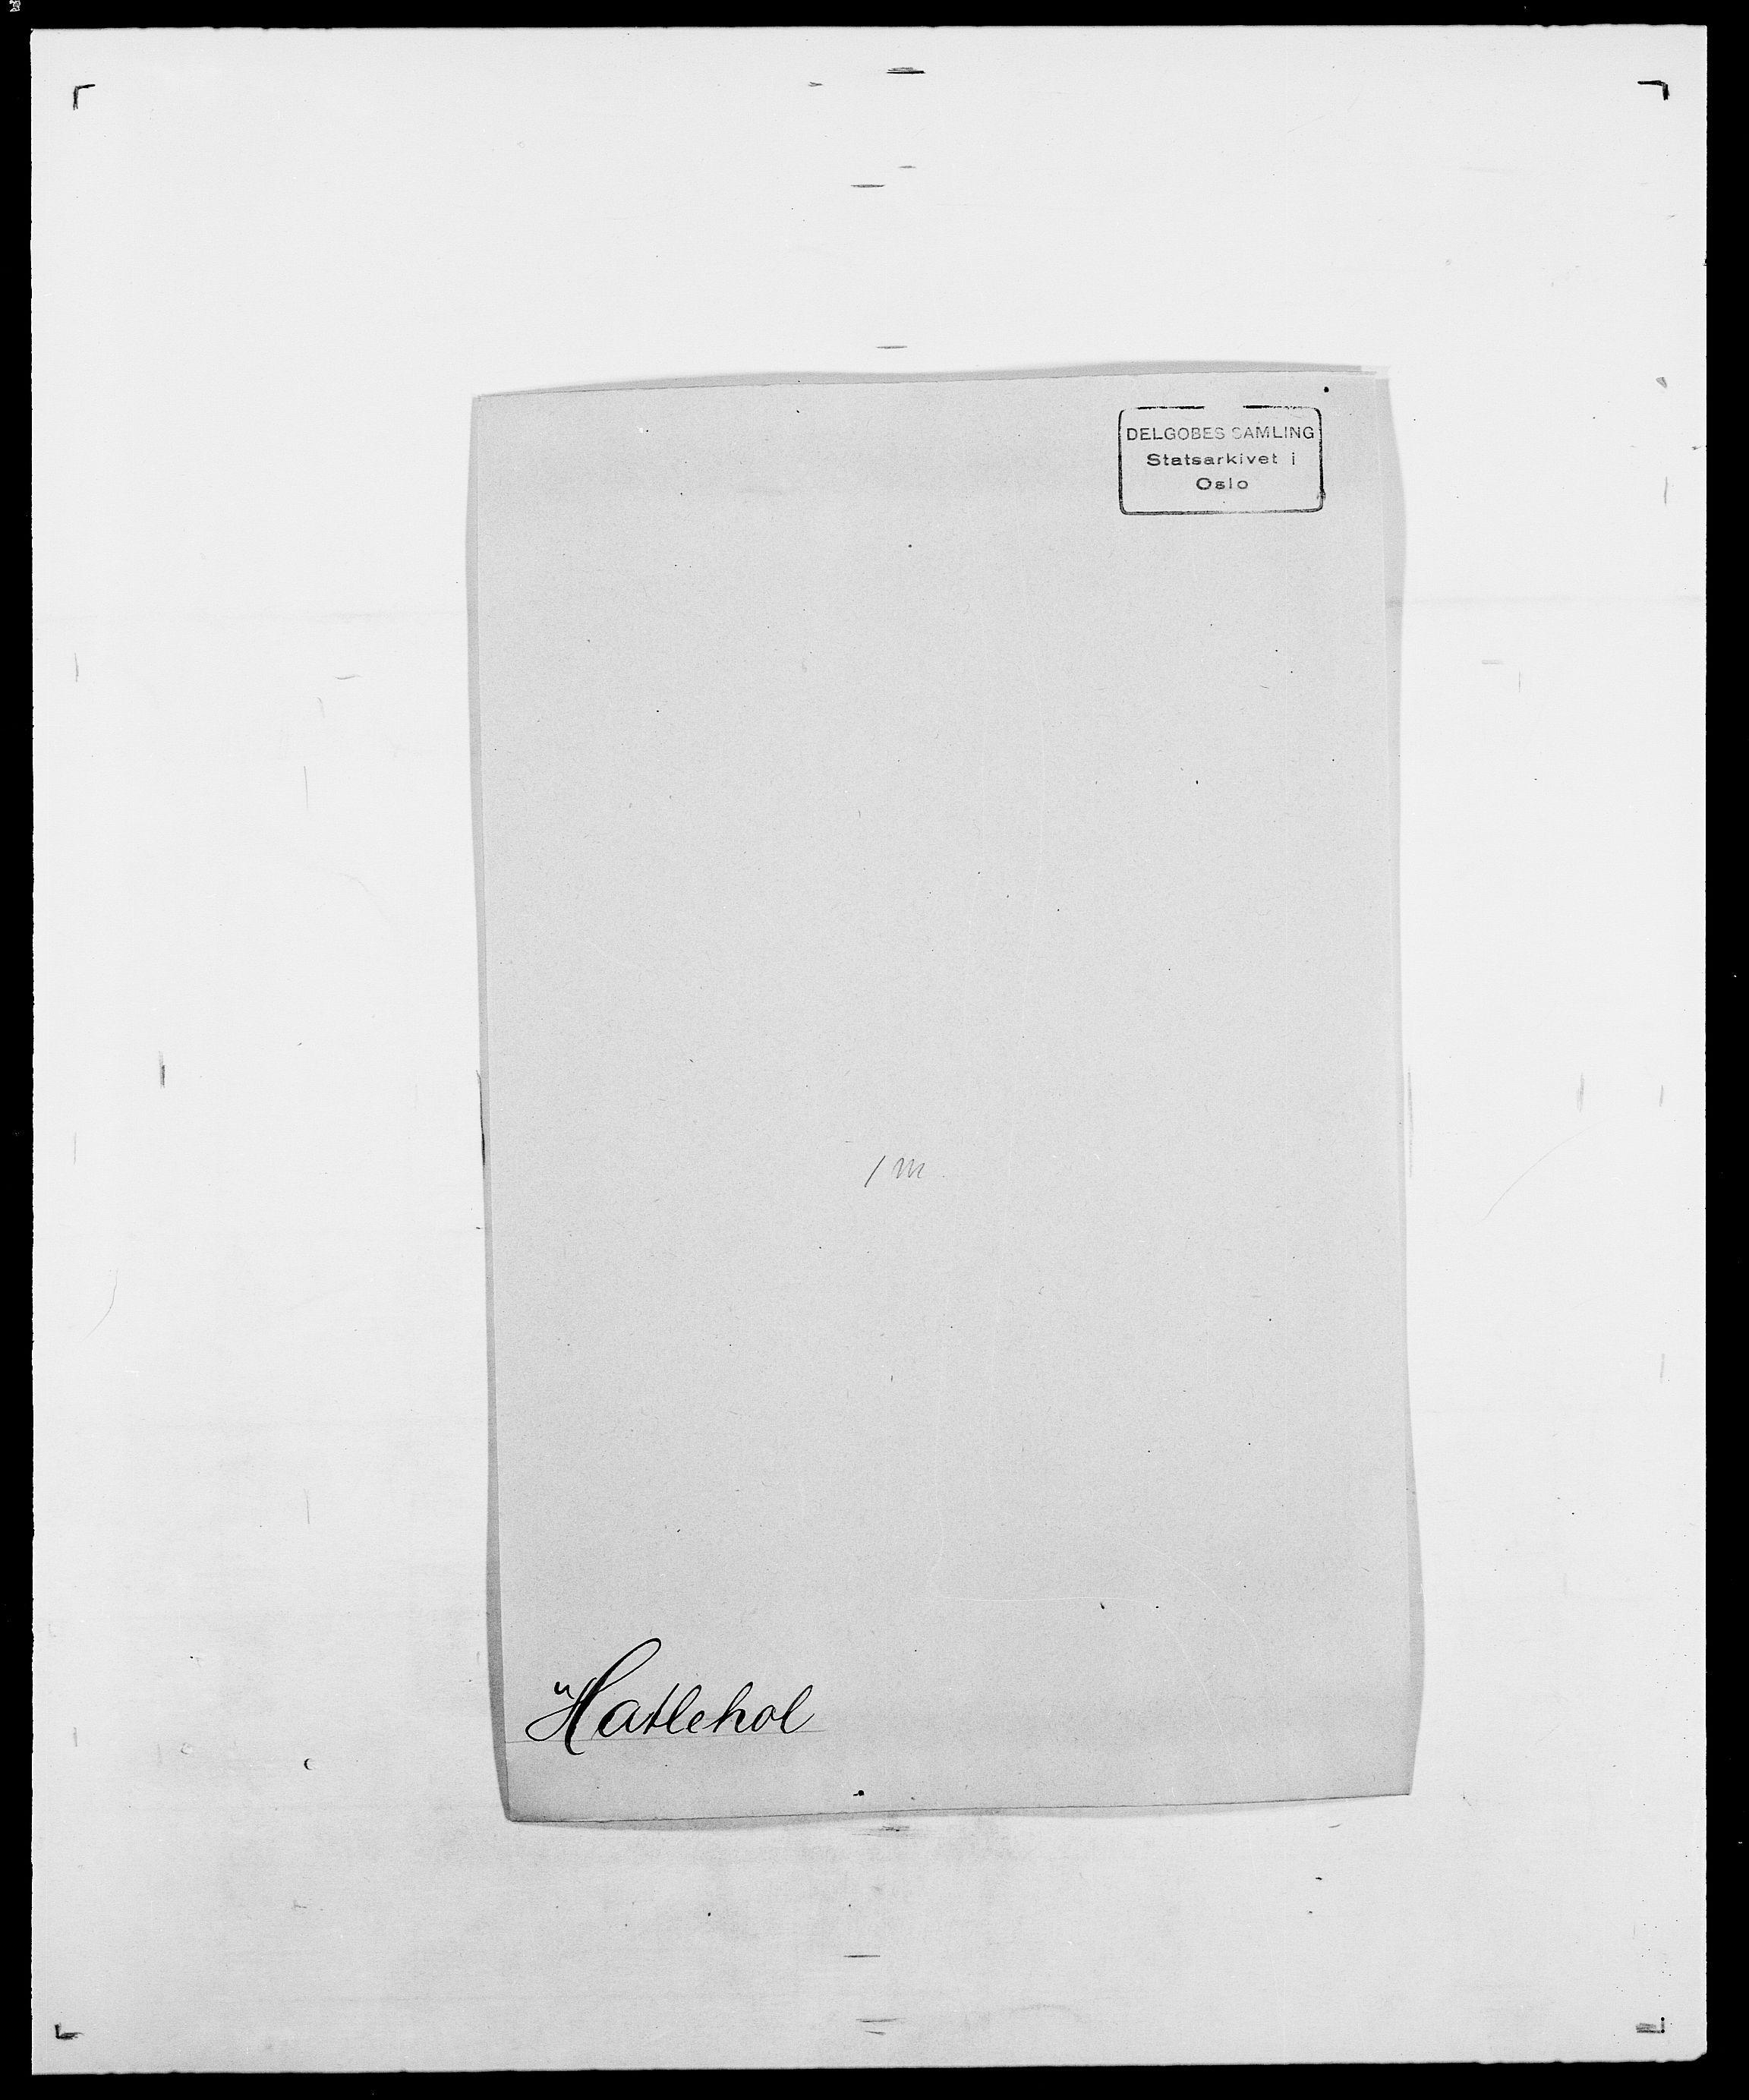 SAO, Delgobe, Charles Antoine - samling, D/Da/L0016: Hamborg - Hektoen, s. 574